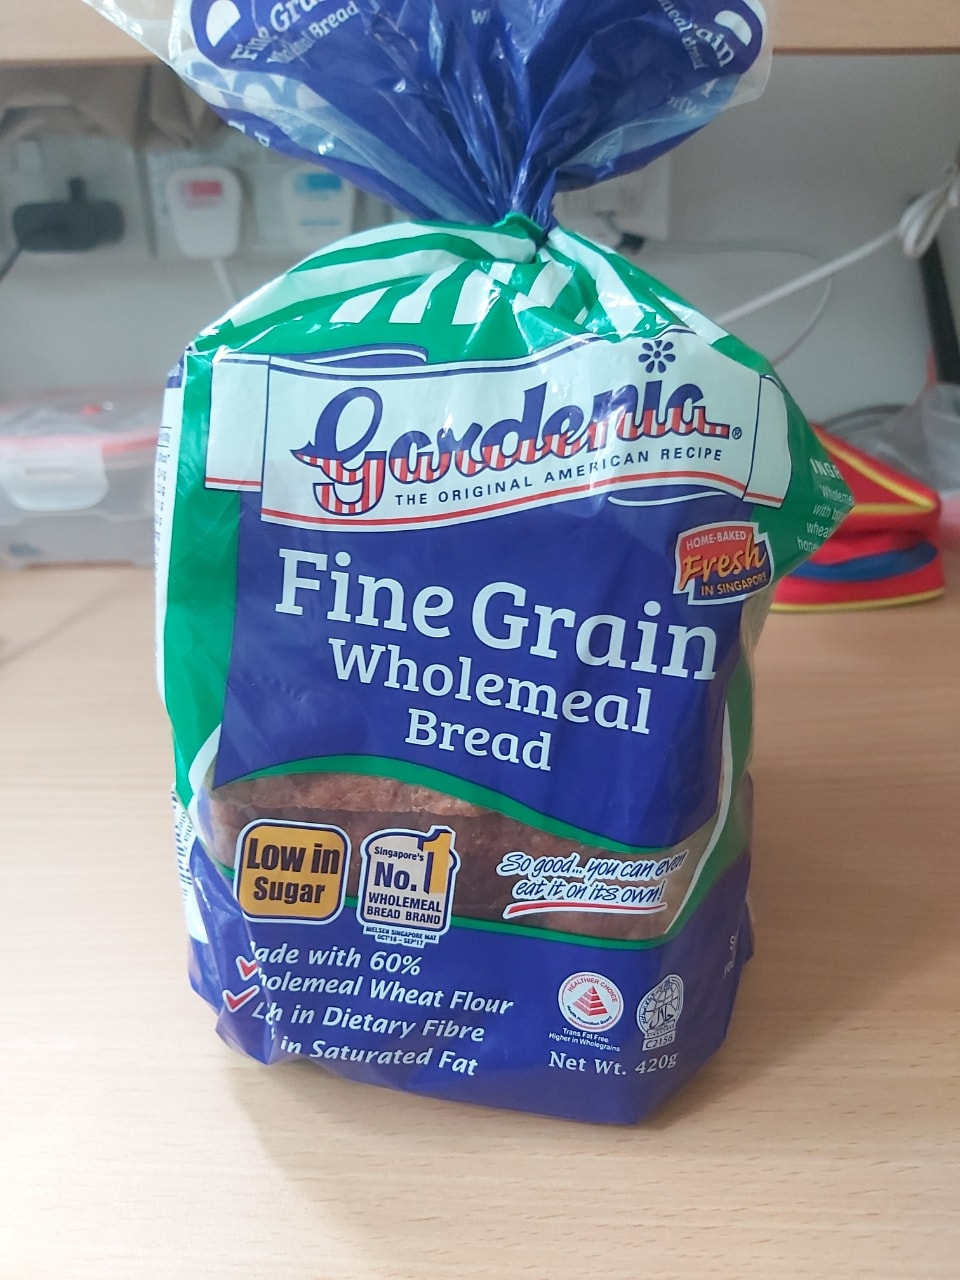 Gardenia Wholemeal Bread